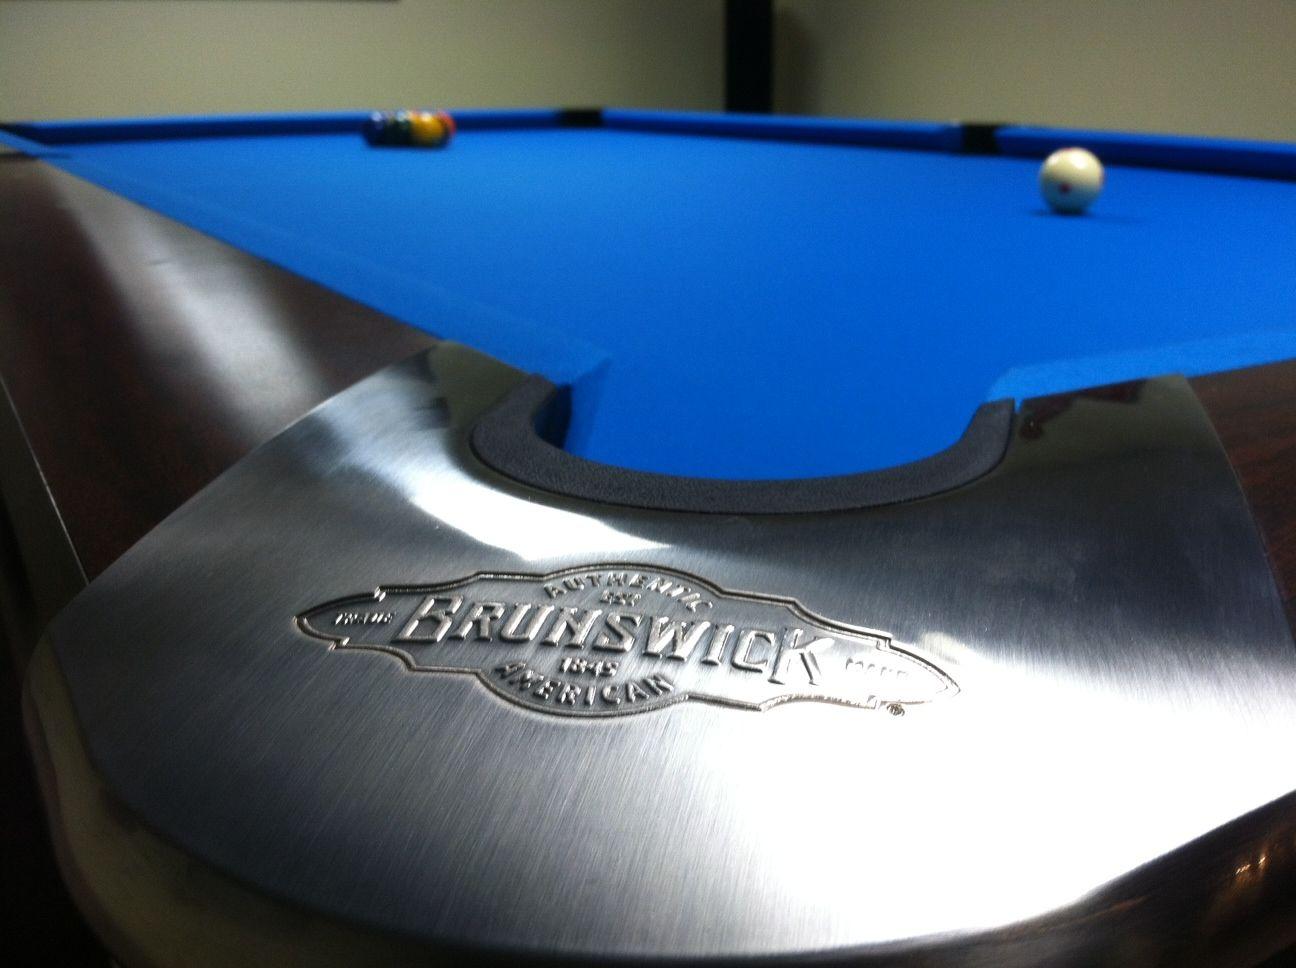 Brunswick Gold Crown Table Everything Billiards Www.everythingbilliards.net